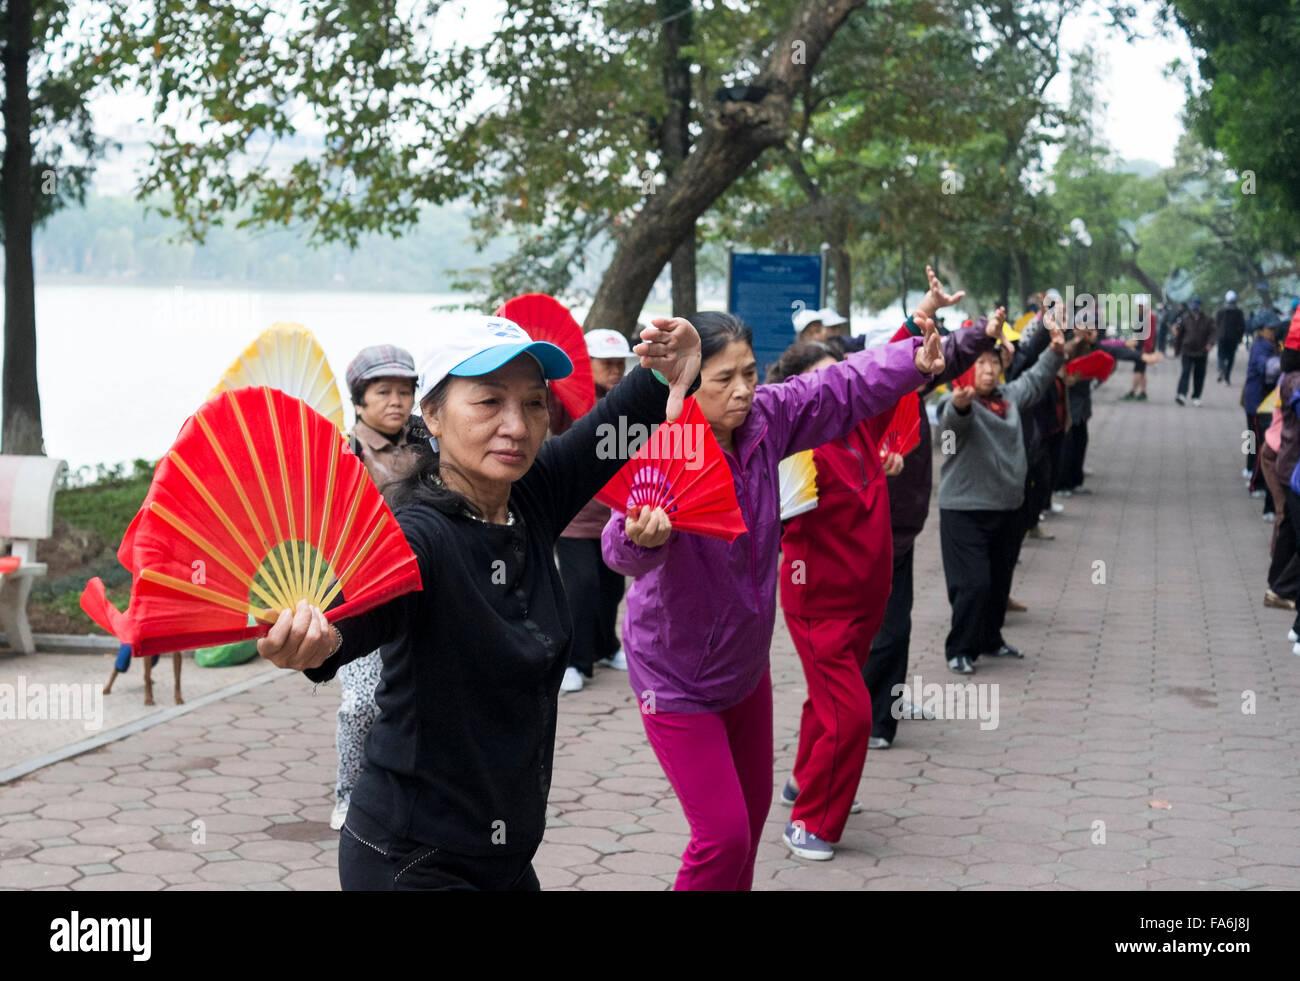 Public exercise class next to Hoan Kiem Lake, centre of Hanoi,Vietnam. - Stock Image